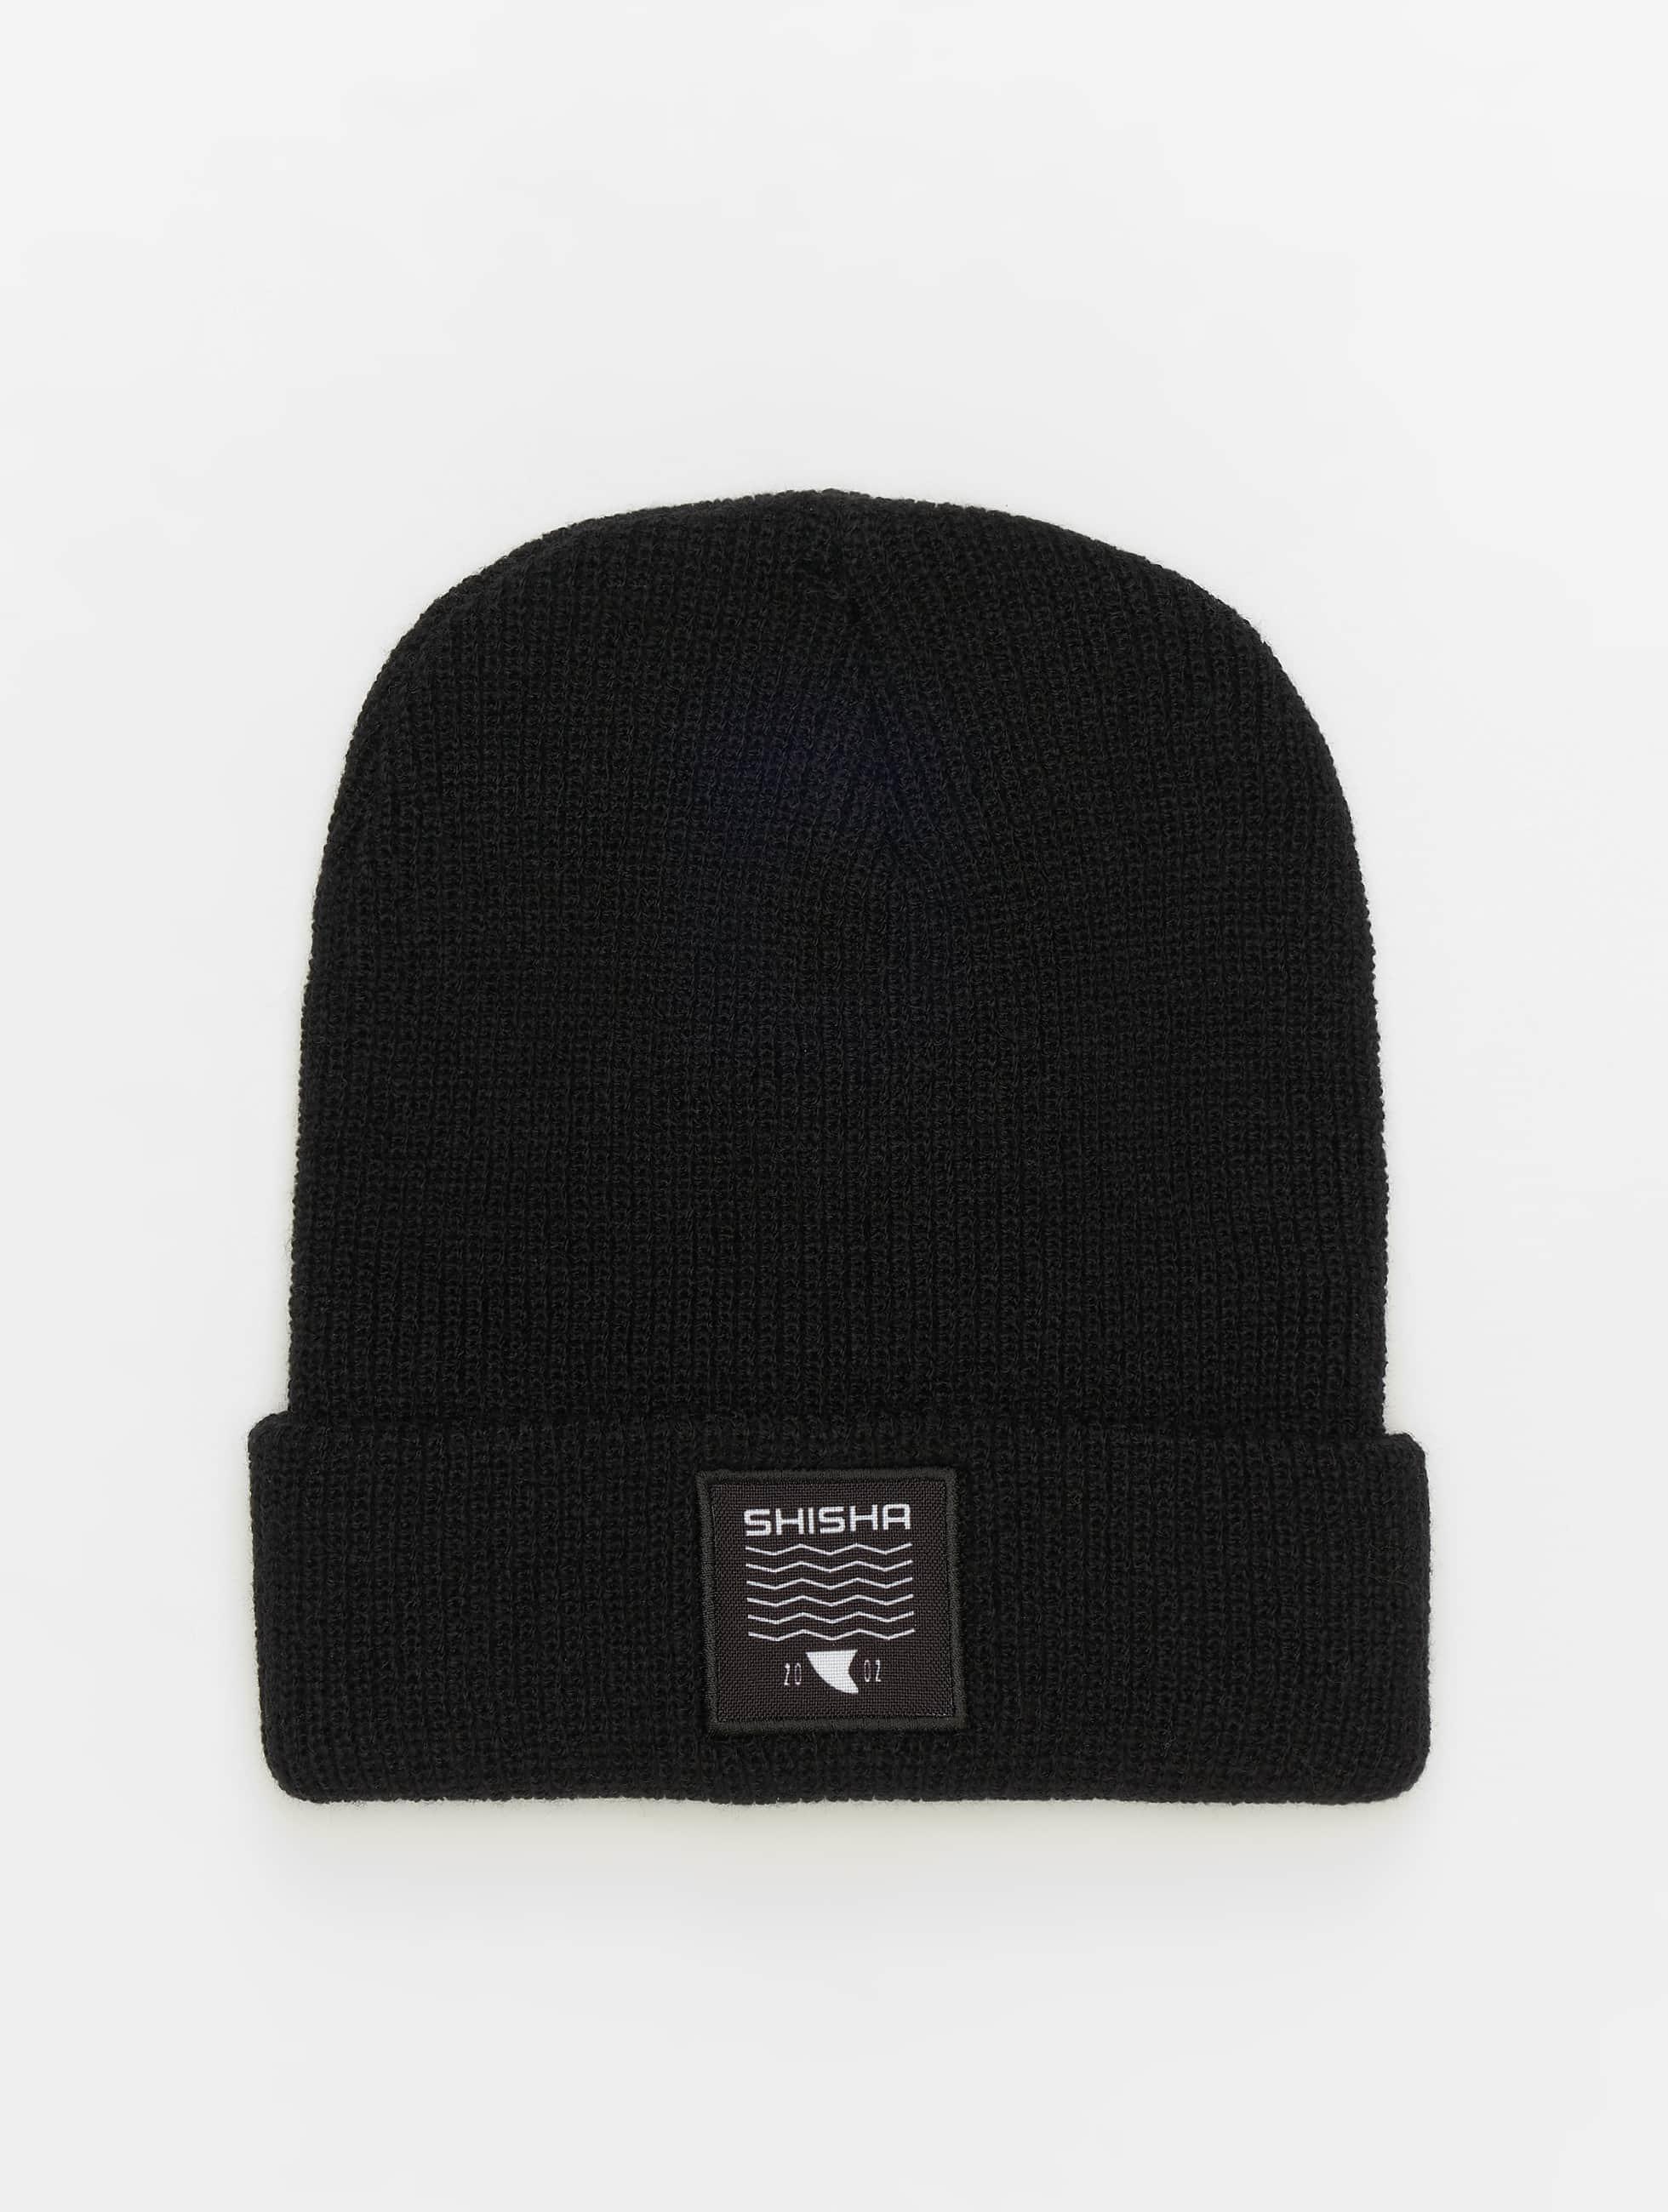 Shisha  Hat-1 Slurvoss black